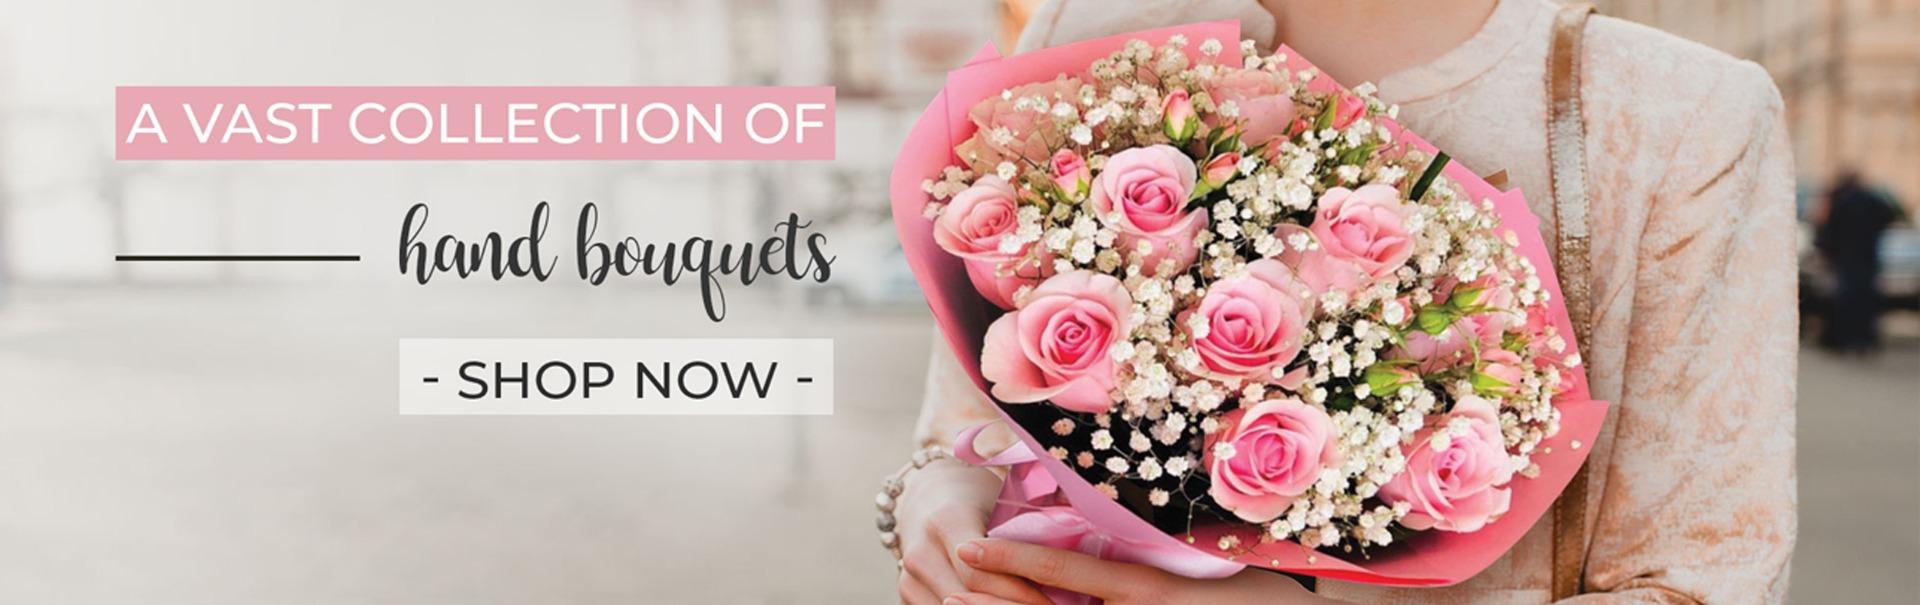 /flower-delivery-services-online-riyadh/buy-hand-bouquets-baskets-online-riyadh.html